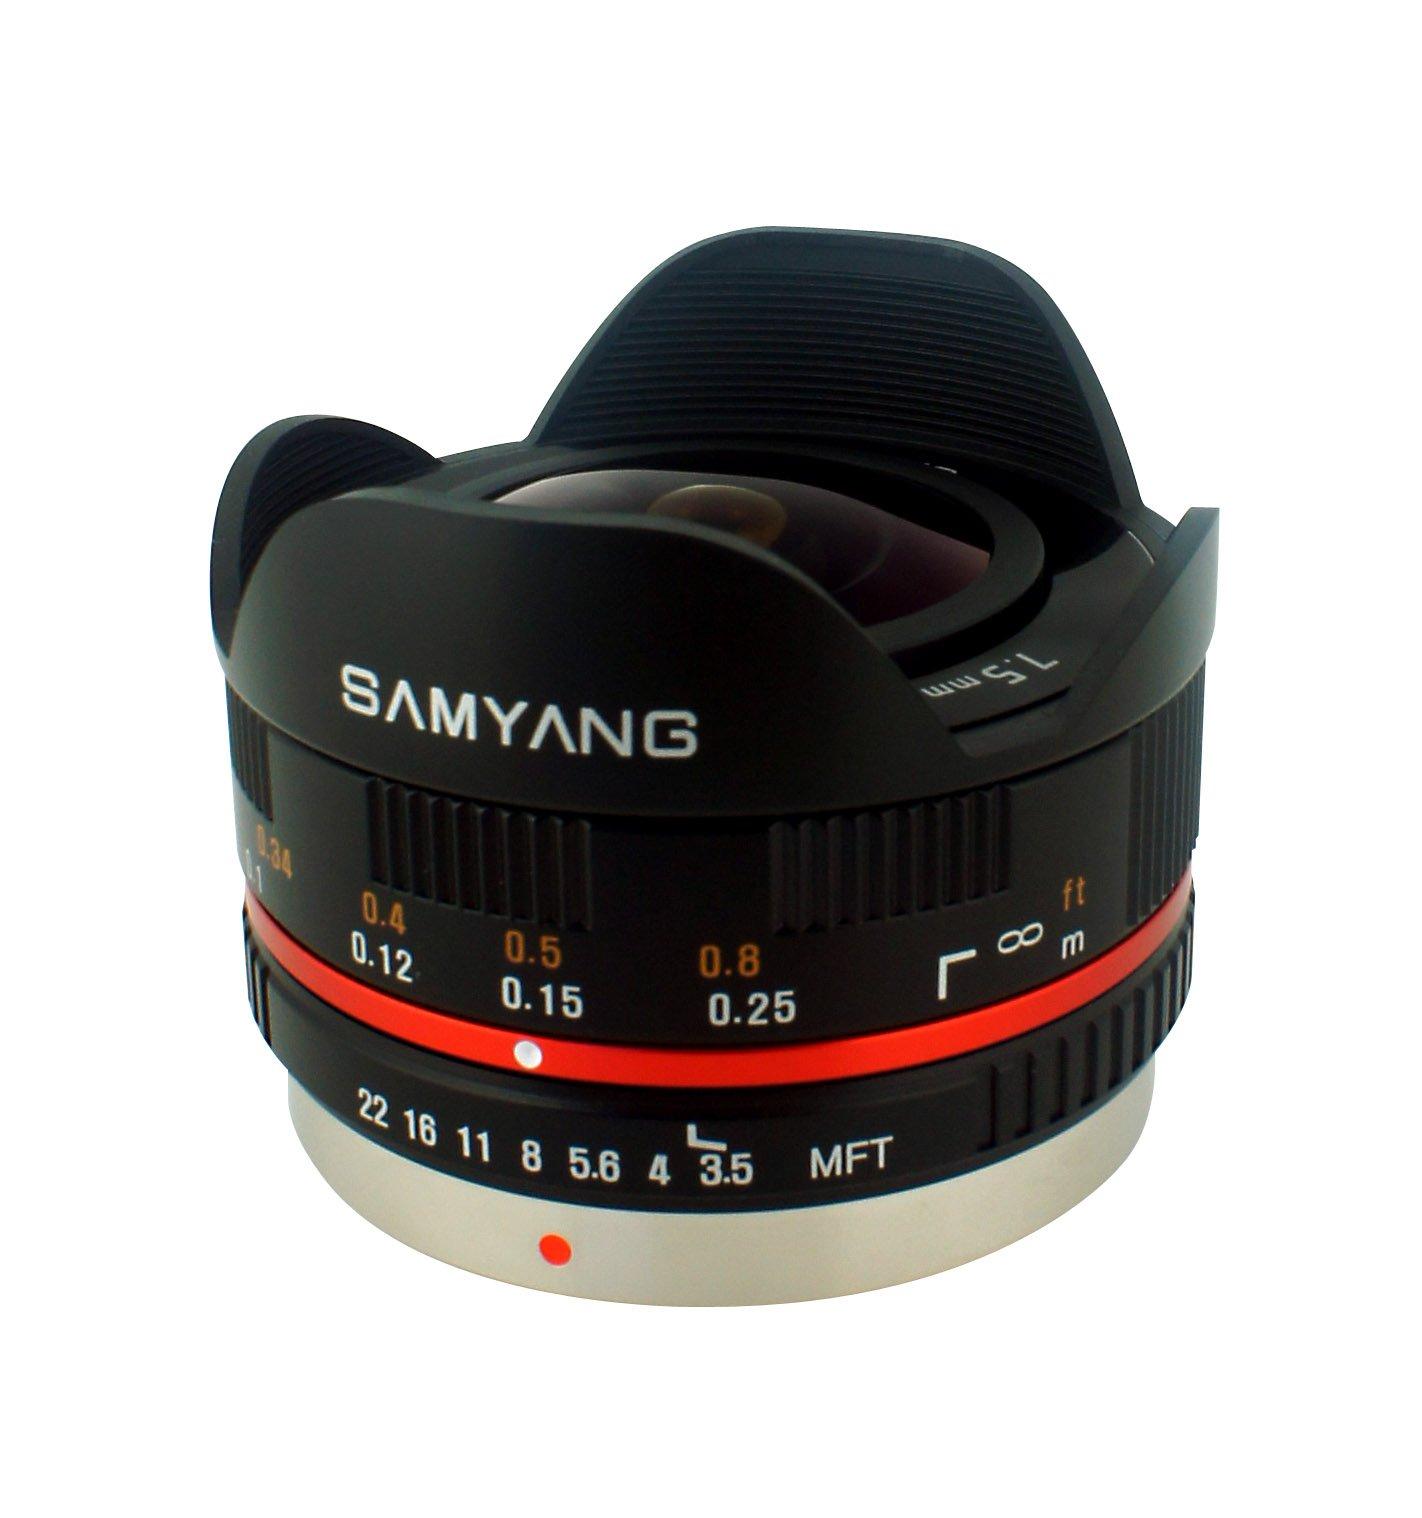 Samyang SY75MFT-B 7.5mm f/3.5 Lens for Micro Four Thirds by Samyang